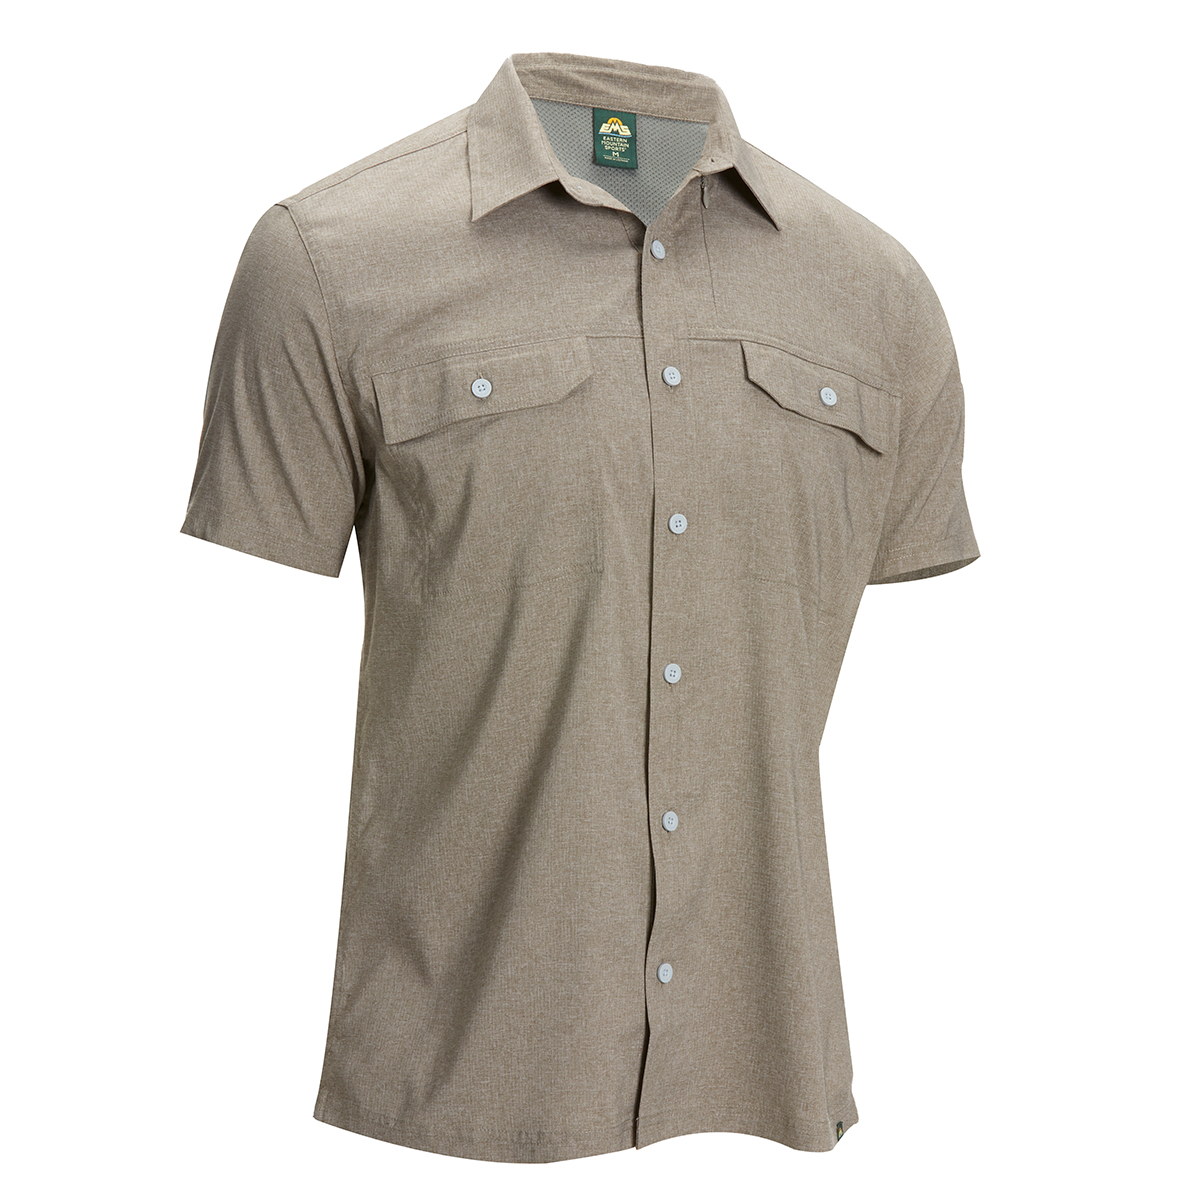 Ems Men's Ventilator Short-Sleeve Shirt - Brown, M